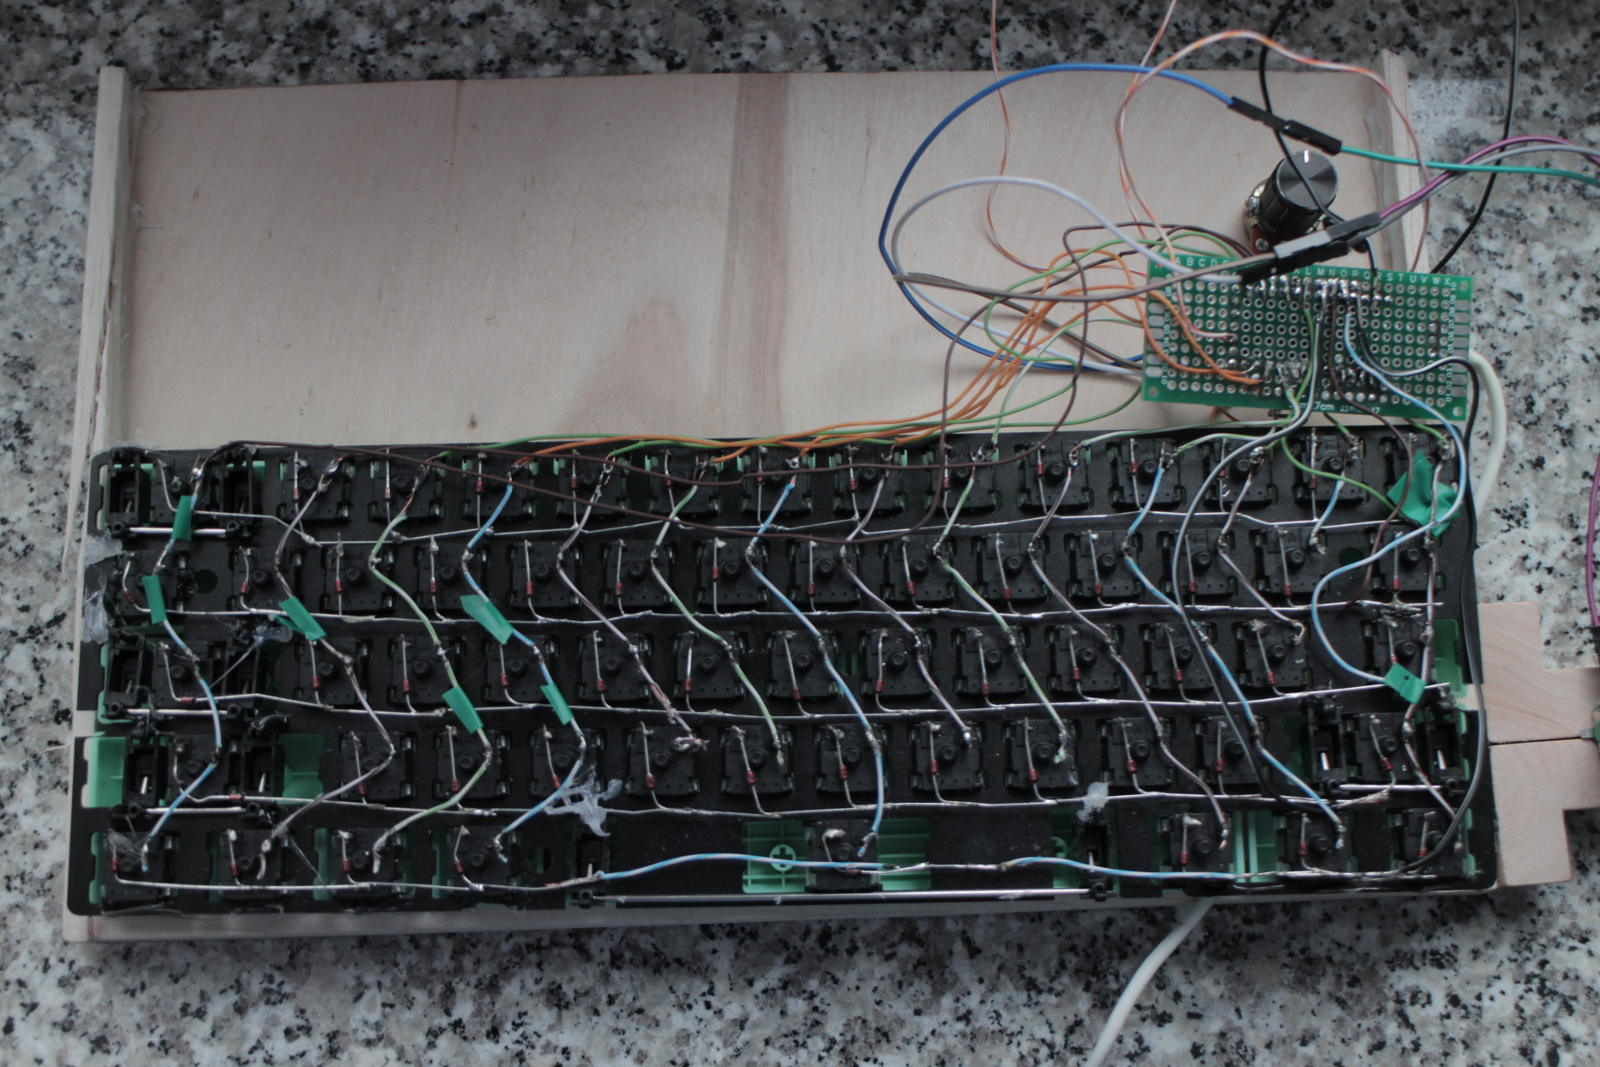 Keyboard bottom